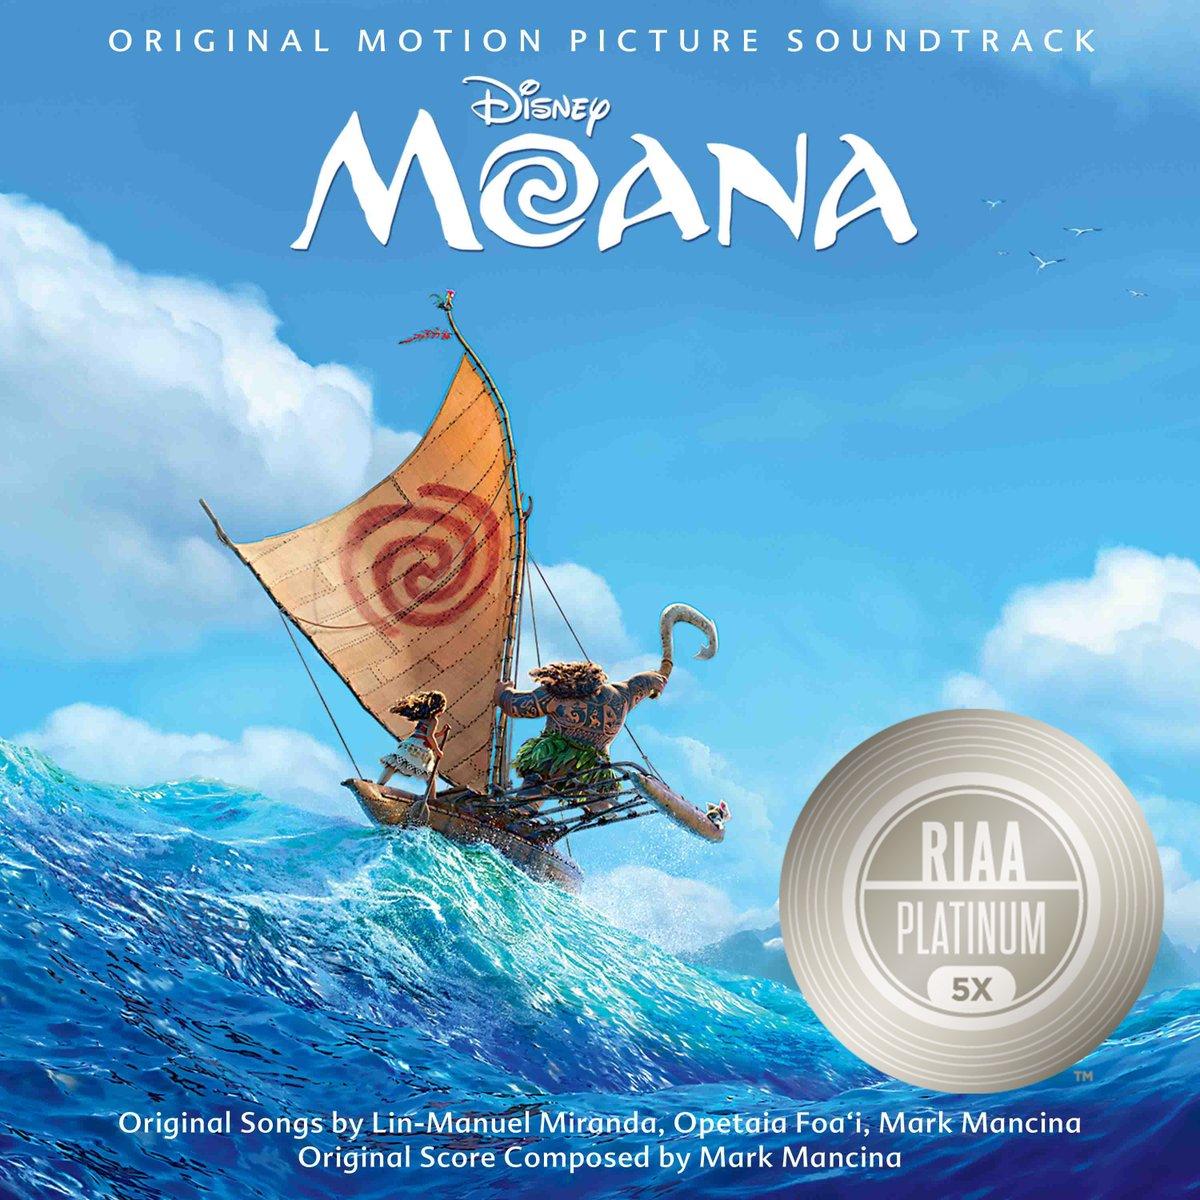 How Far Ill Go from Disneys #Moana is now @RIAA 5x PLATINUM!! 💿💿💿💿💿 Congratulations to @Lin_Manuel, @auliicravalho, and the @DisneyMoana team! 🎶 Listen now on the Disney Hits playlist: disneymusic.co/disneyhitsplay…